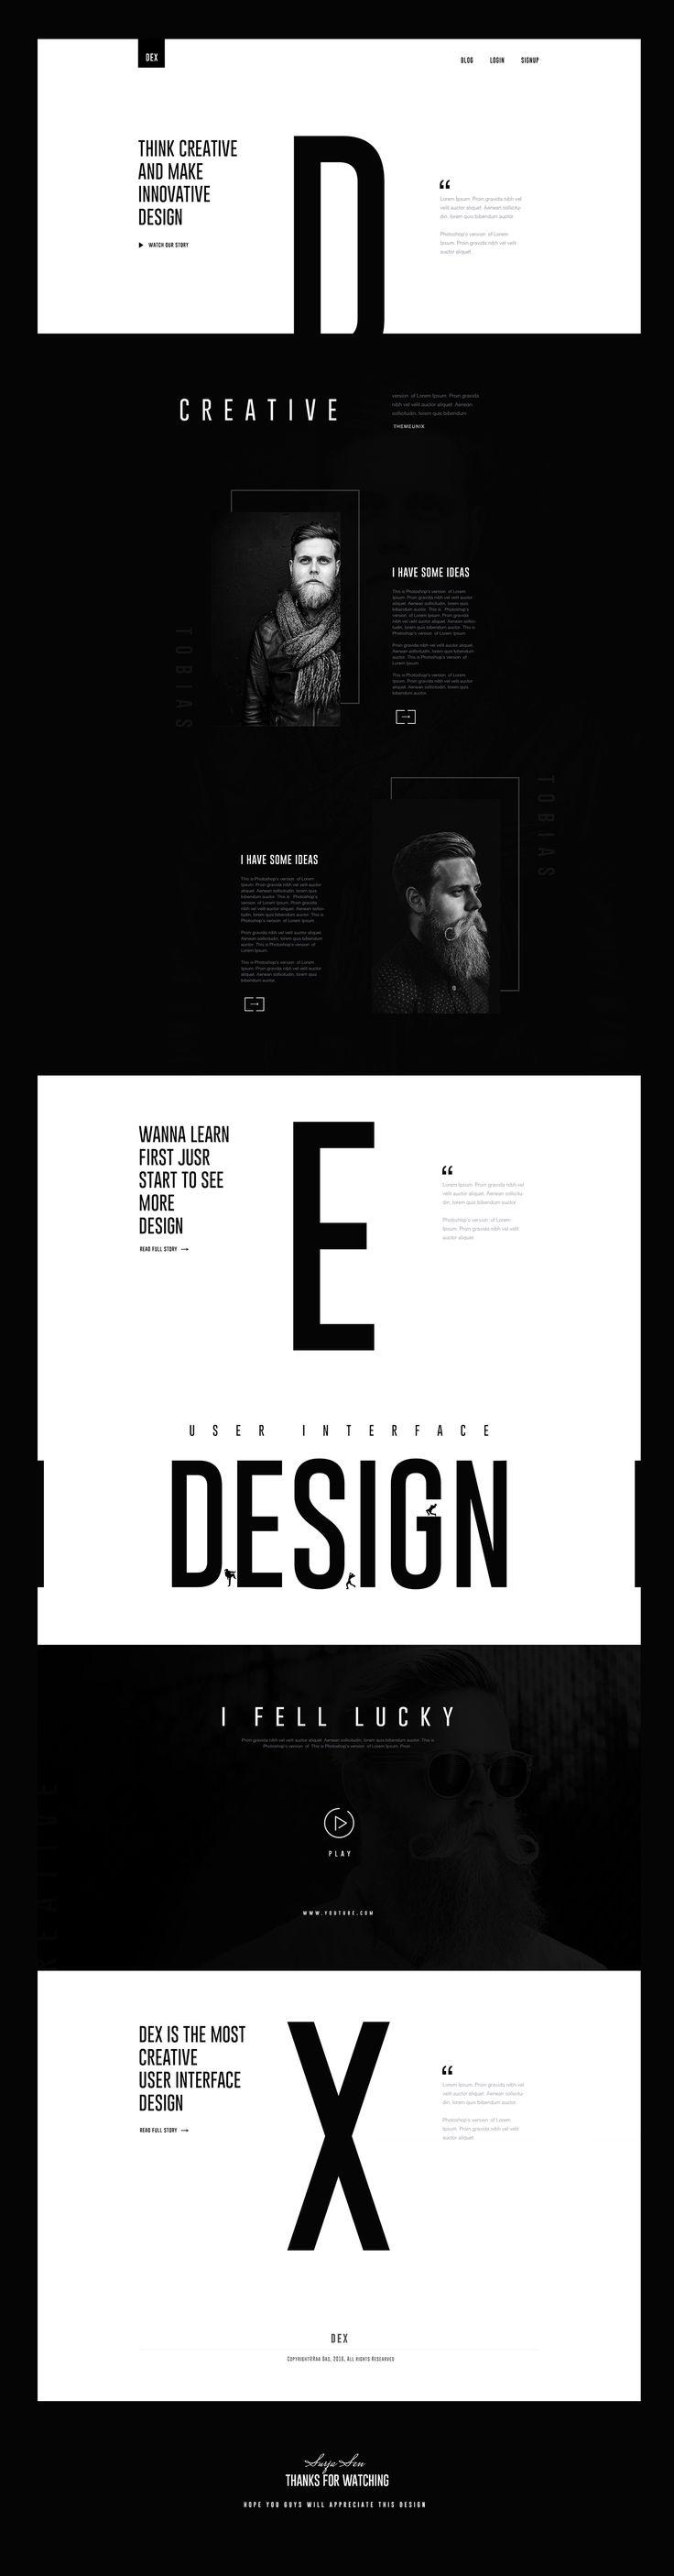 https://www.behance.net/gallery/42274399/DEX-Creative-Landing-Page-Design